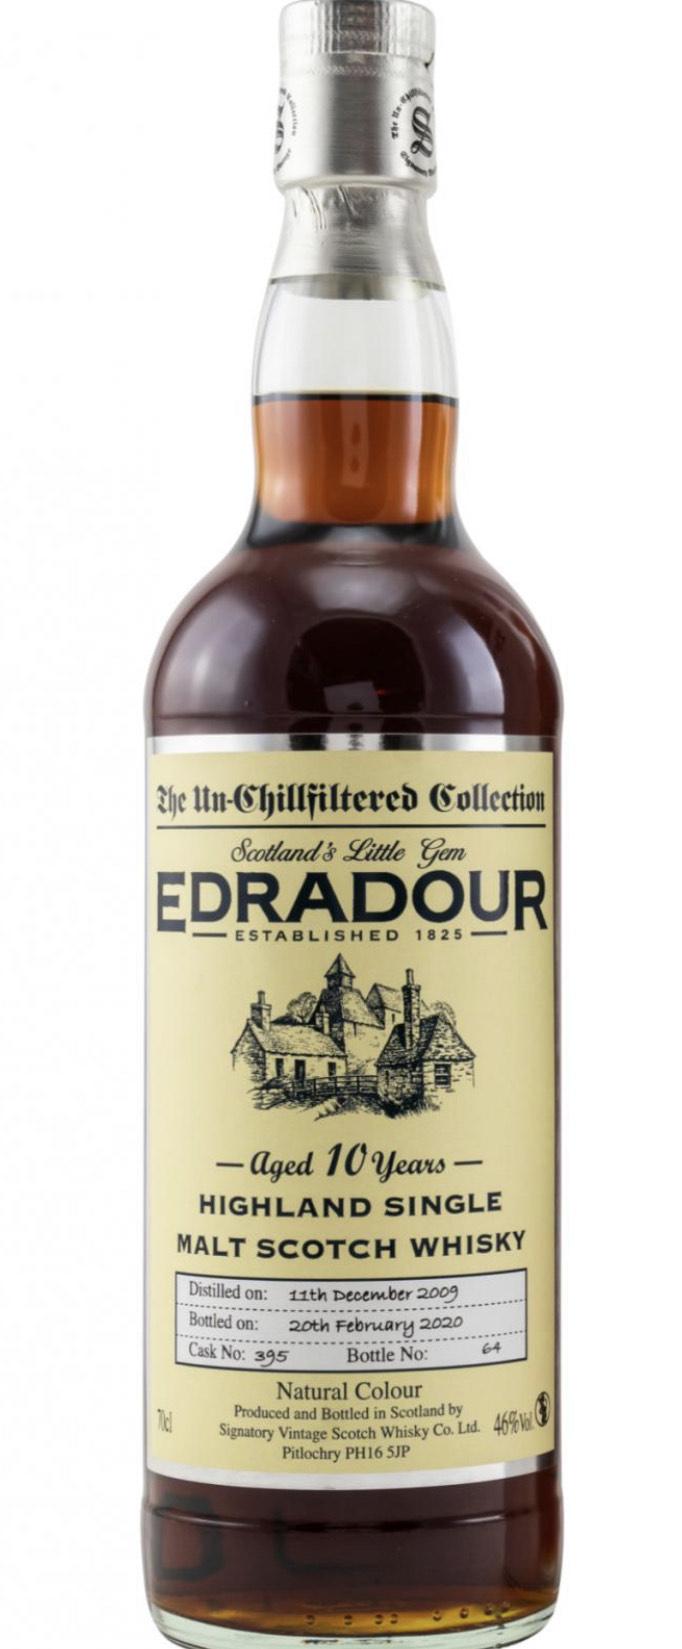 Edradour 10 Jahre 2009/2020 Signatory Un-Chillfiltered 46.0% 0,7l. Single Malt Whisky